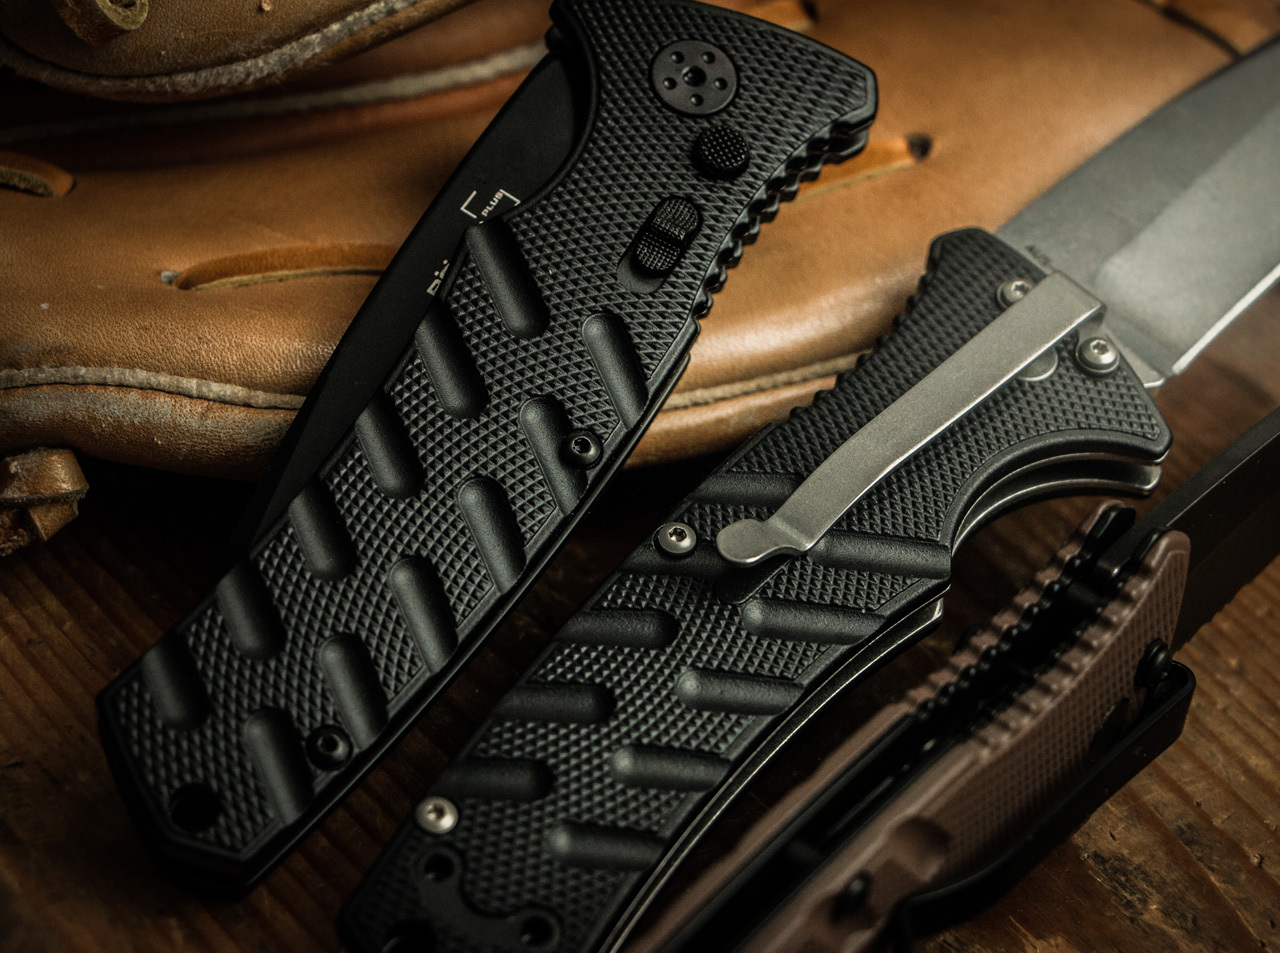 Фото 12 - Полуавтоматический складной нож Boker Plus Strike Spearpoint, сталь AUS-8 StoneWash Plain, рукоять анодированный алюминий, BK01BO400